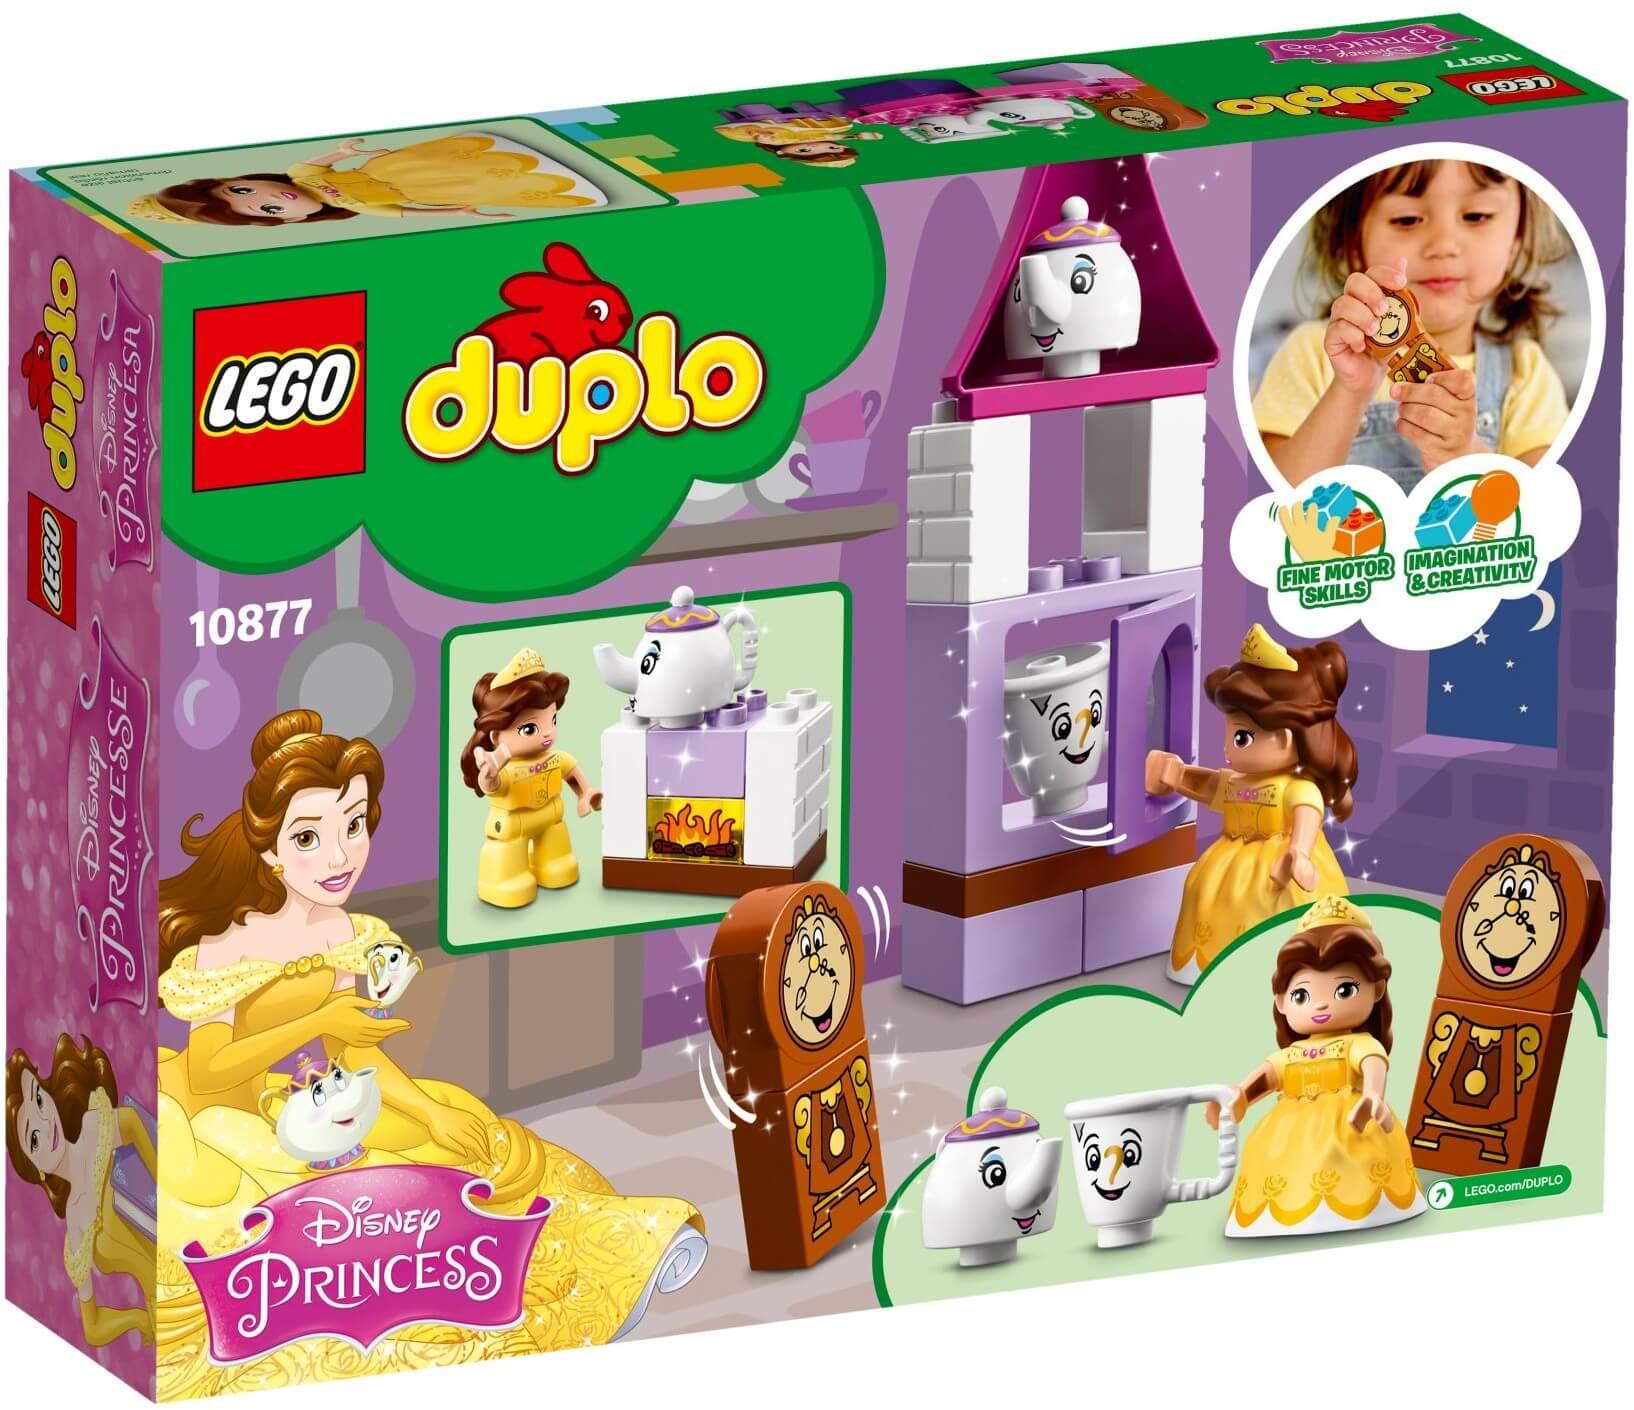 Mua đồ chơi LEGO 10877 - LEGO Duplo 10877 - Bữa Tiệc Trà của Belle (LEGO Duplo 10877 Belle´s Tea Party)